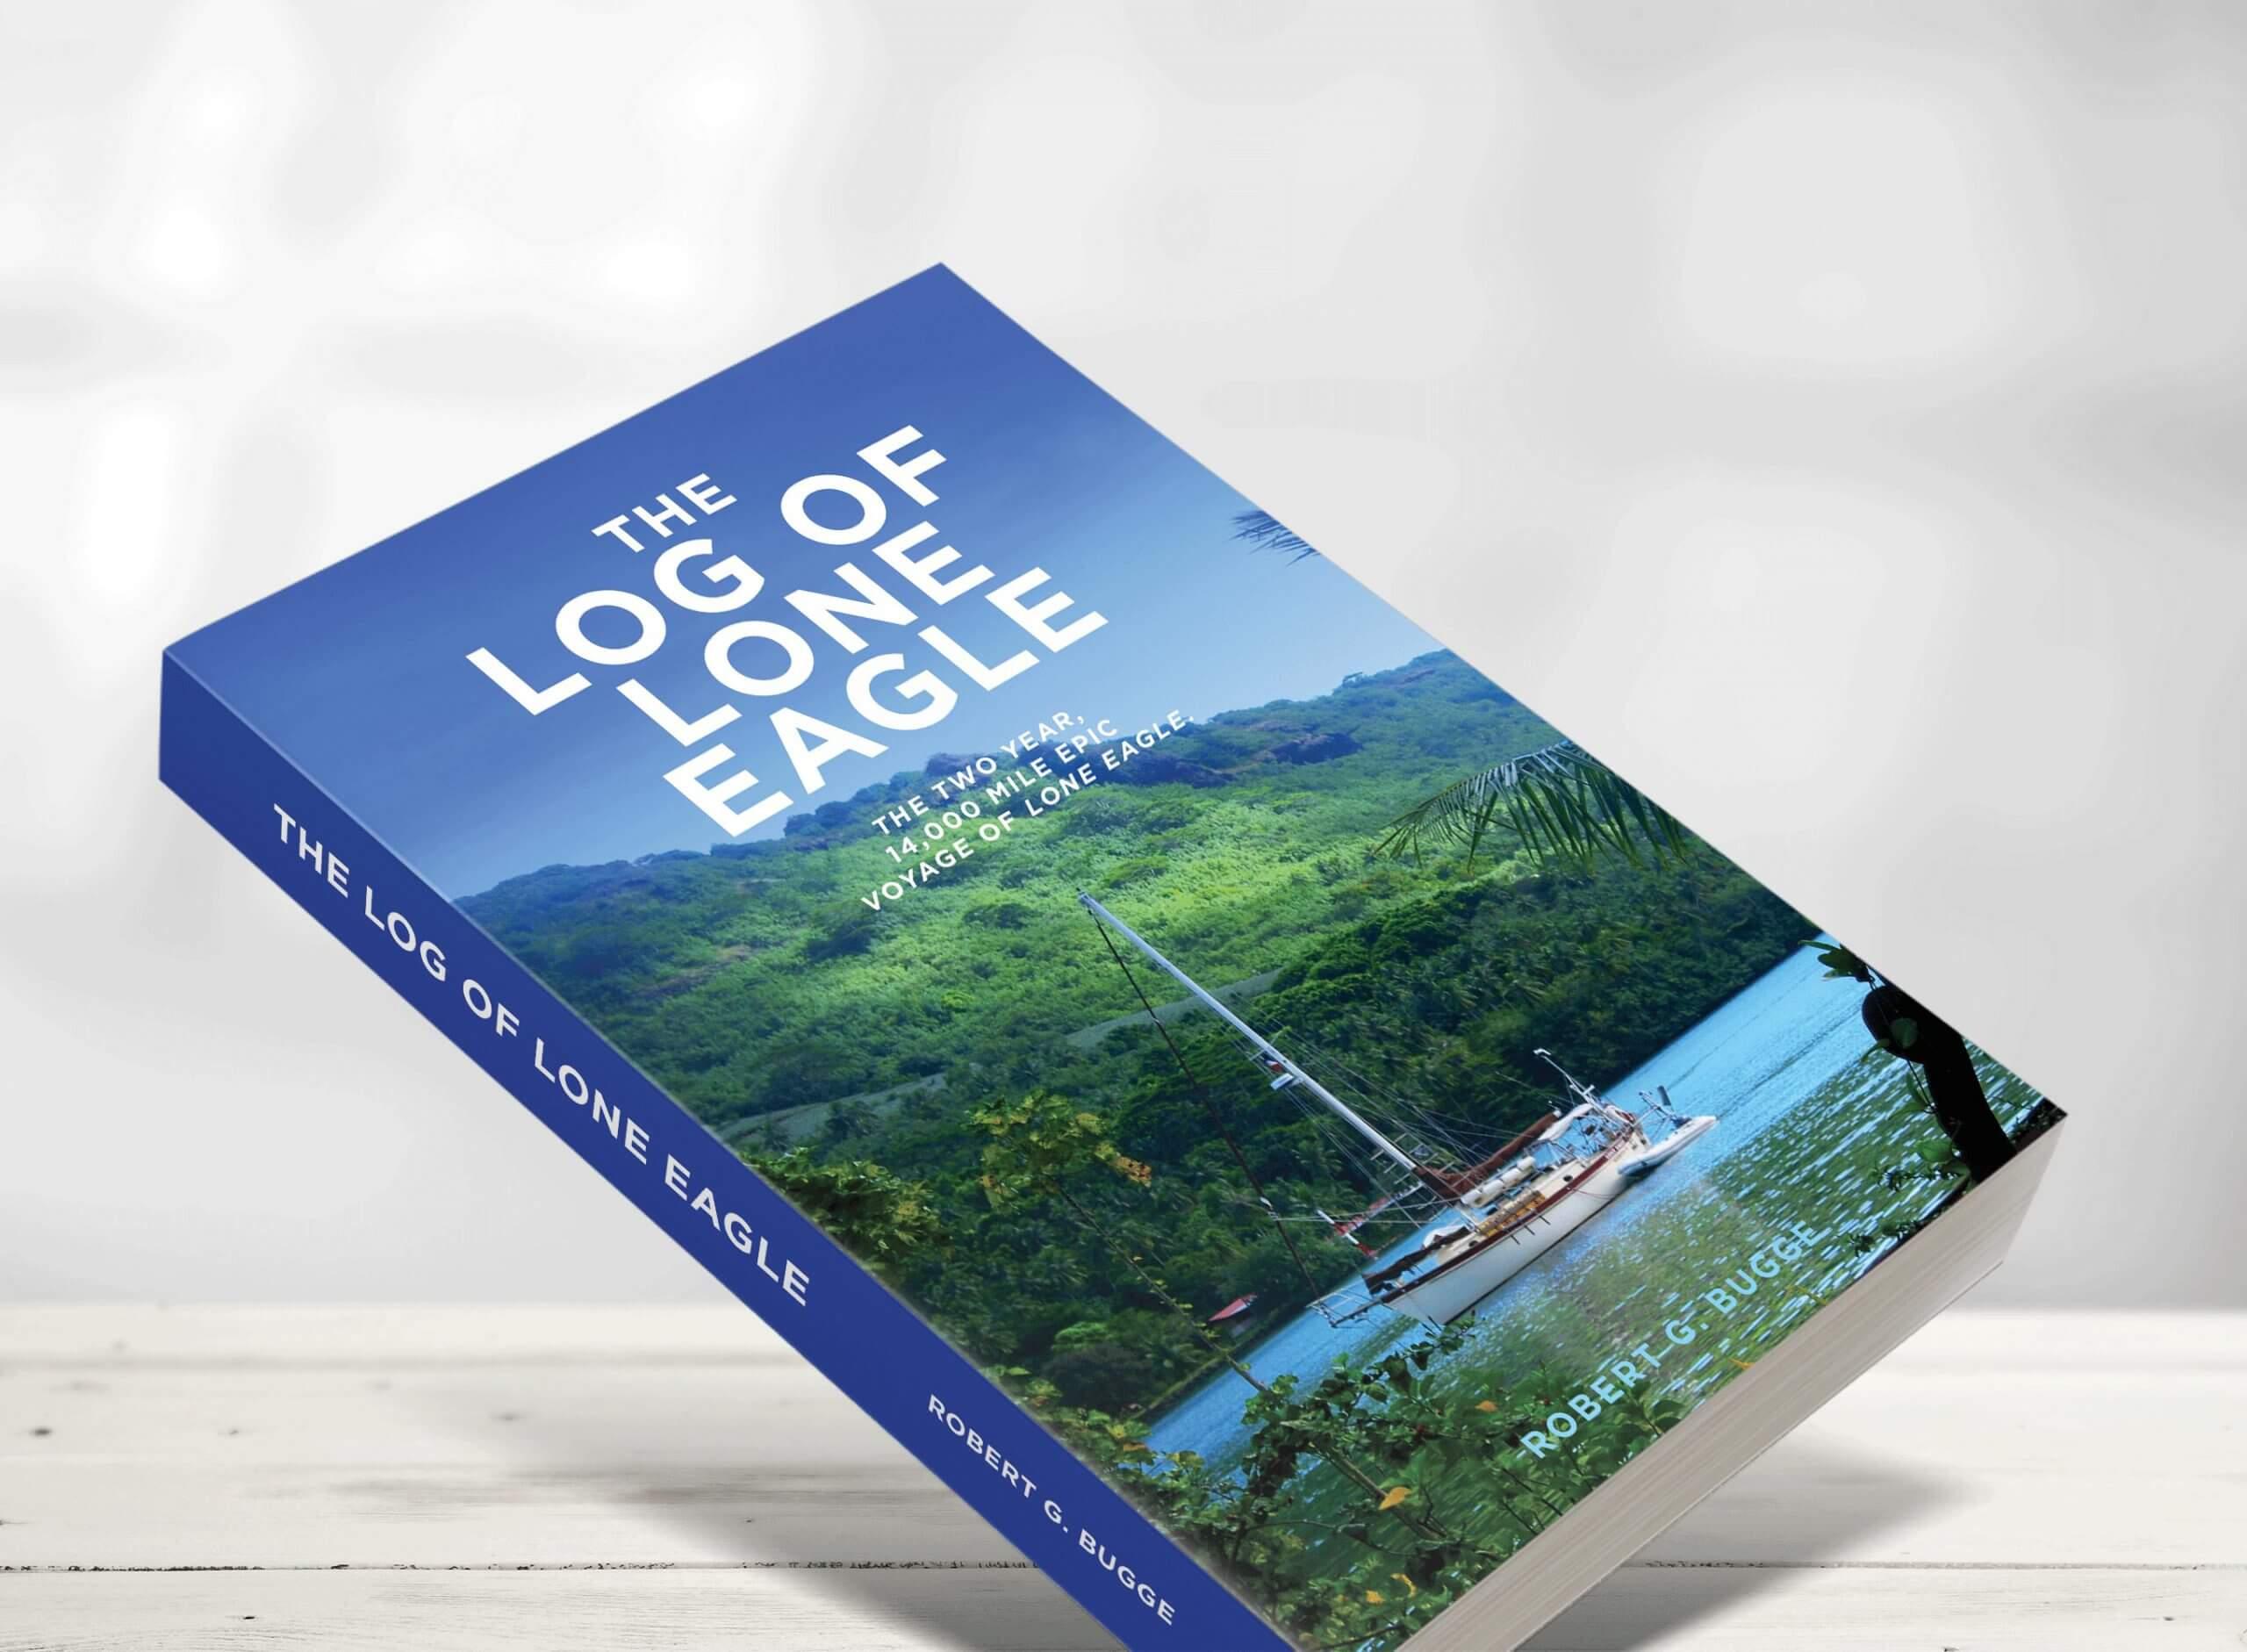 lone-book-cover